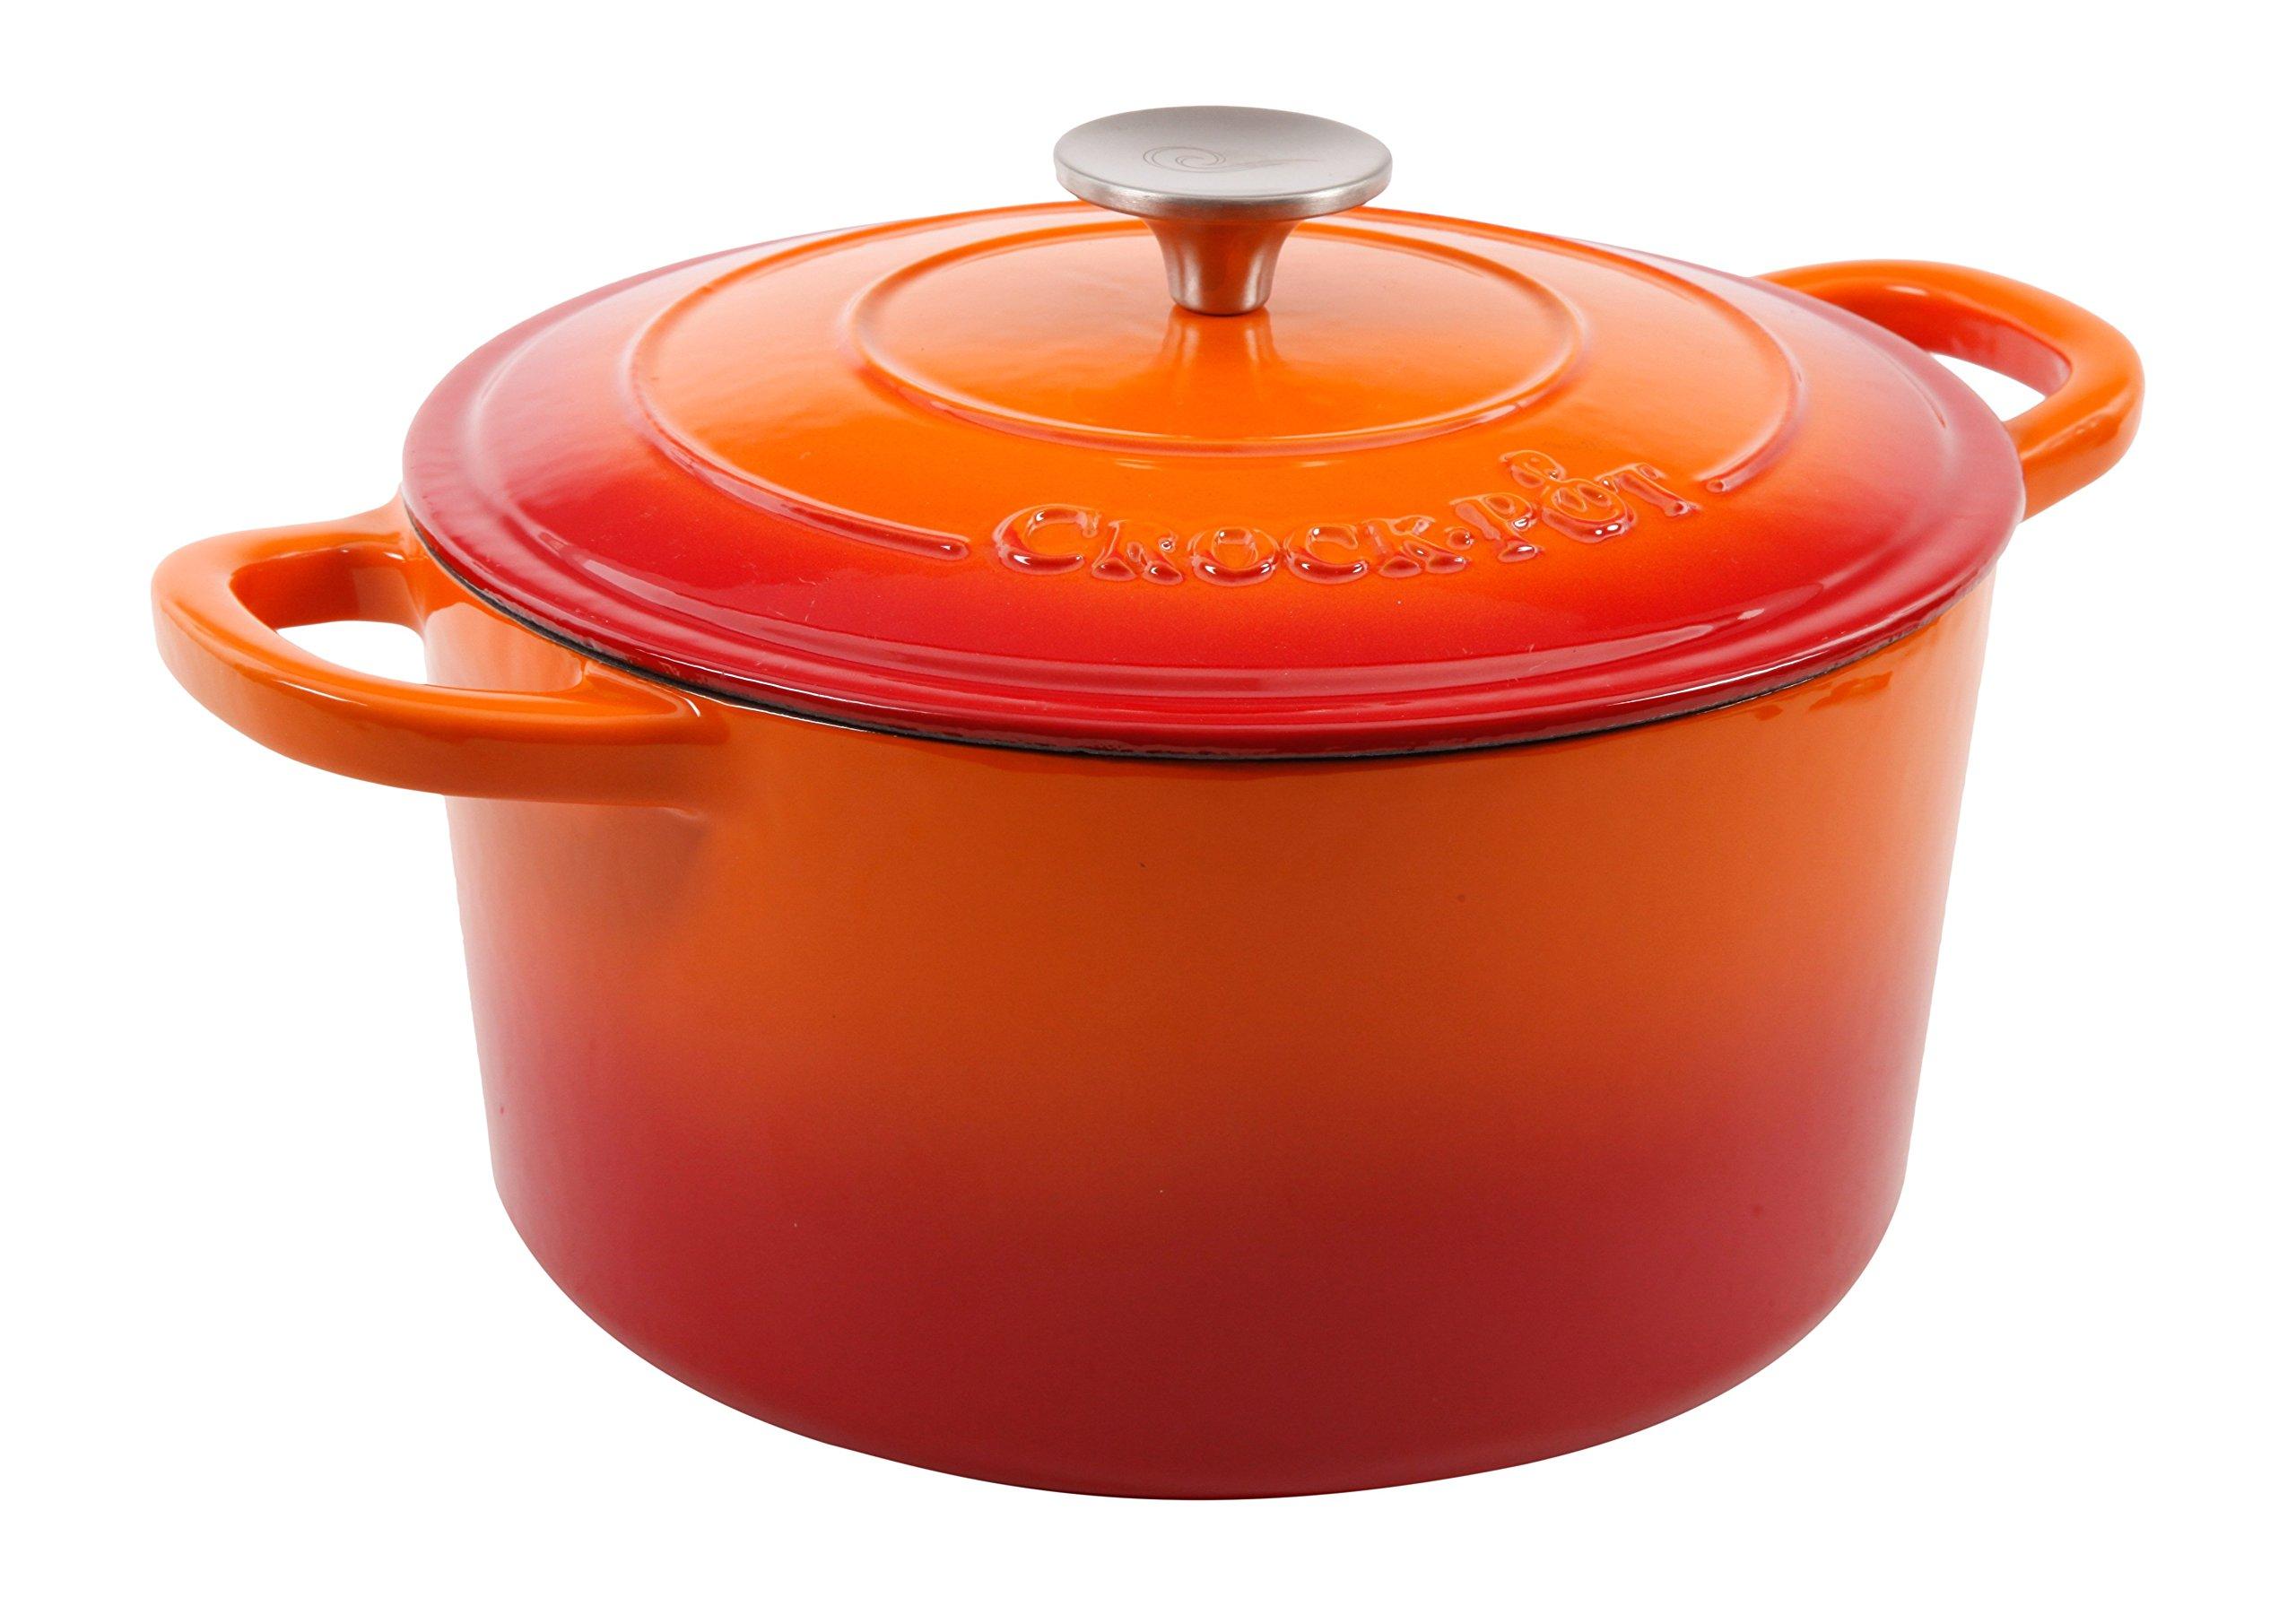 Crock Pot Artisan Round Enameled Cast Iron Dutch Oven, 5-Quart, Sunset Orange